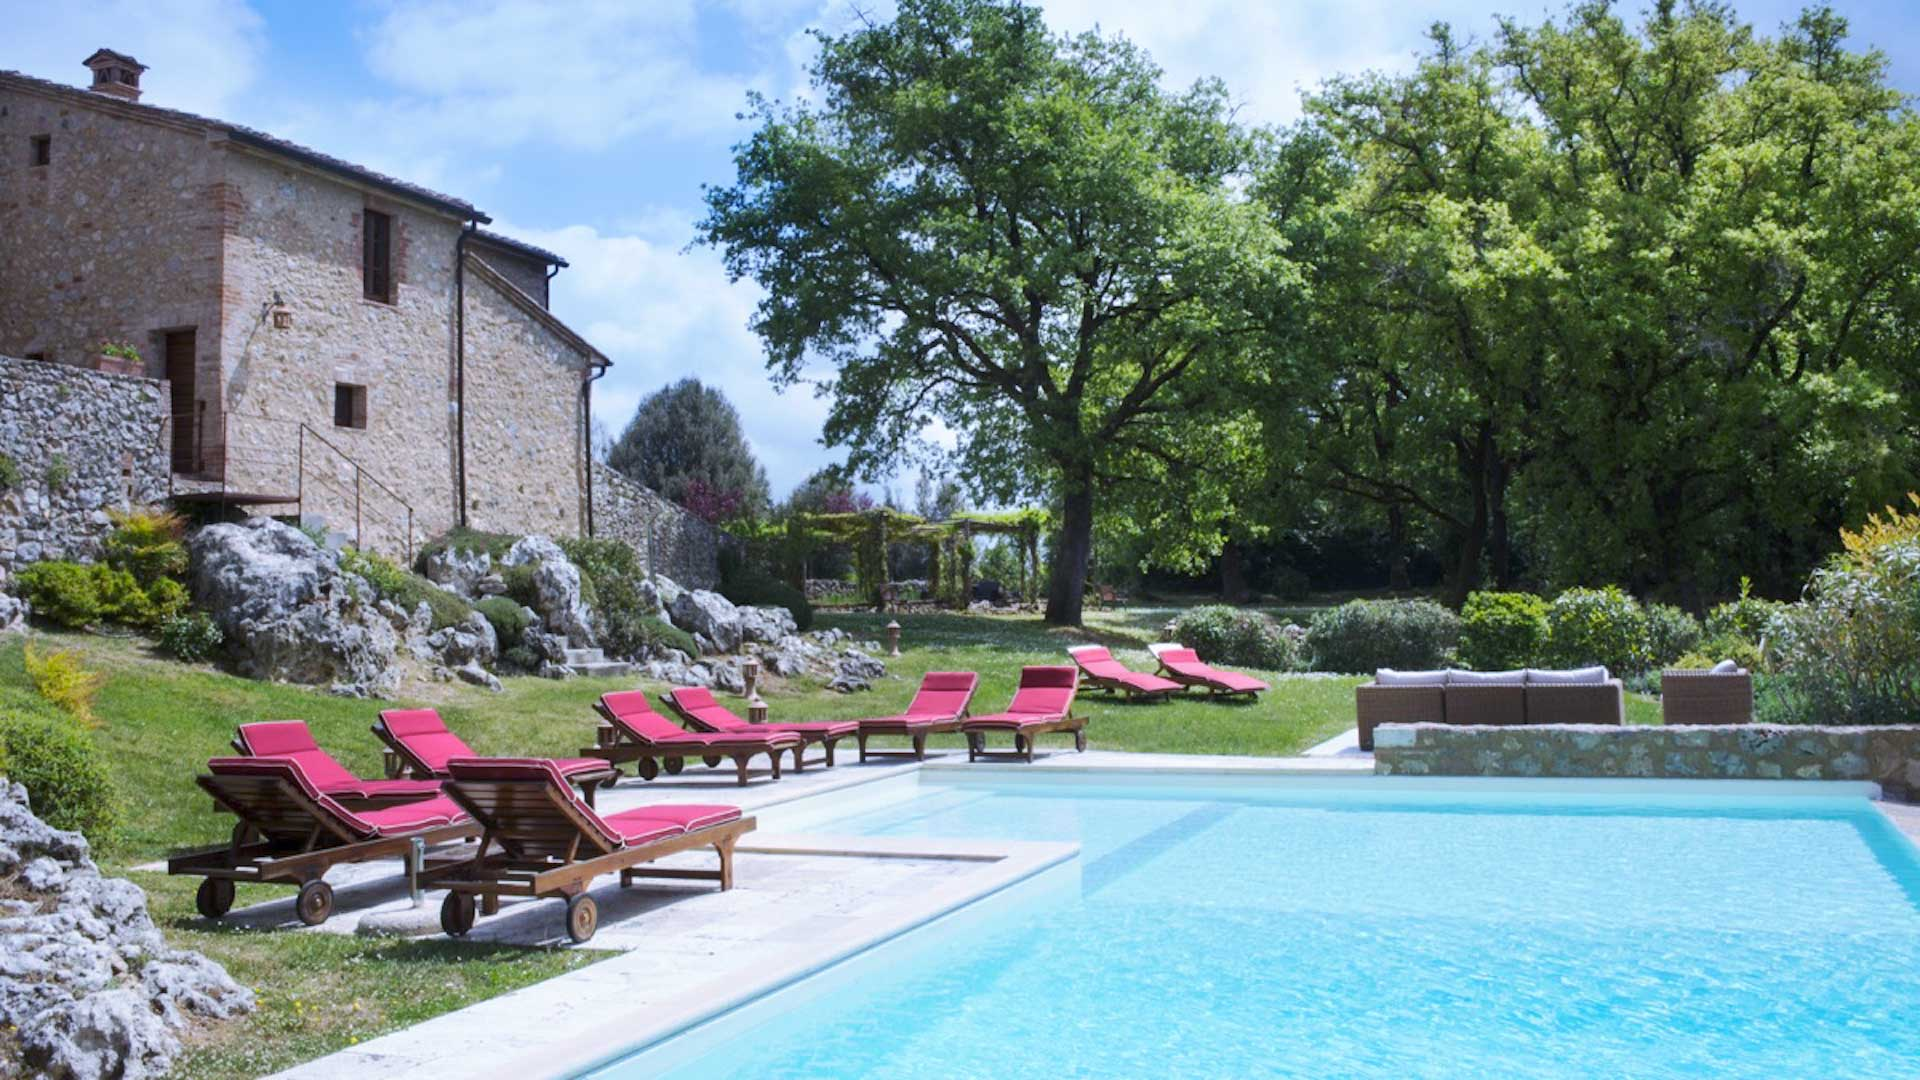 Villa Villa del Campo, Rental in Tuscany